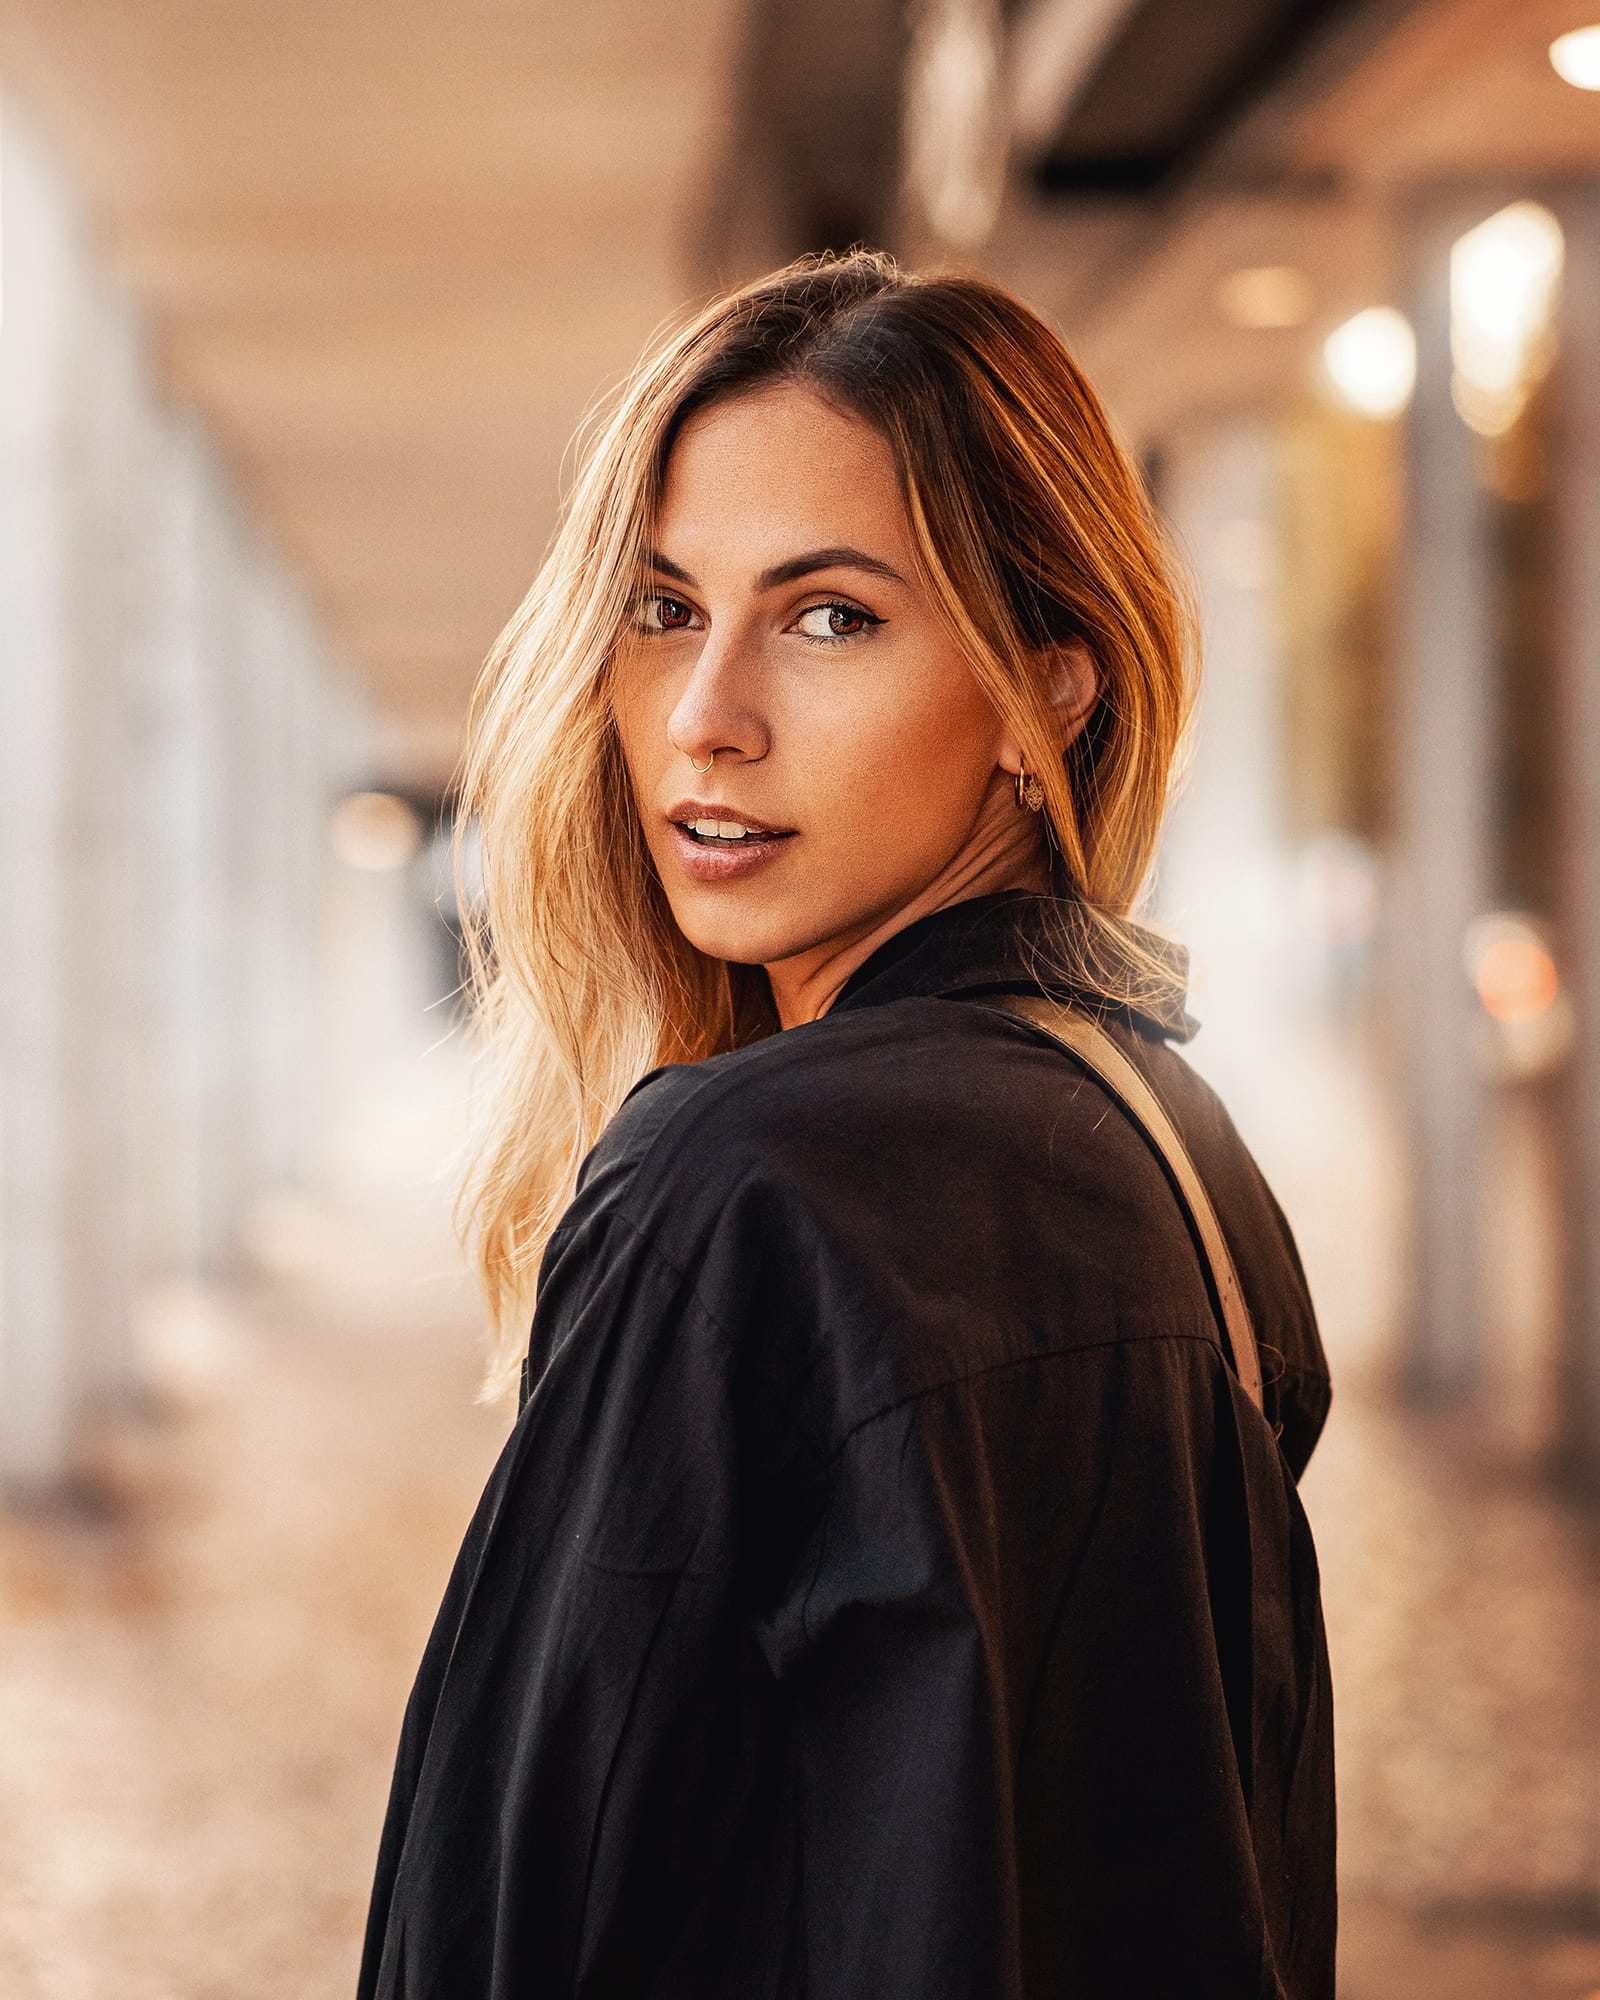 Daniela_Hannover_04